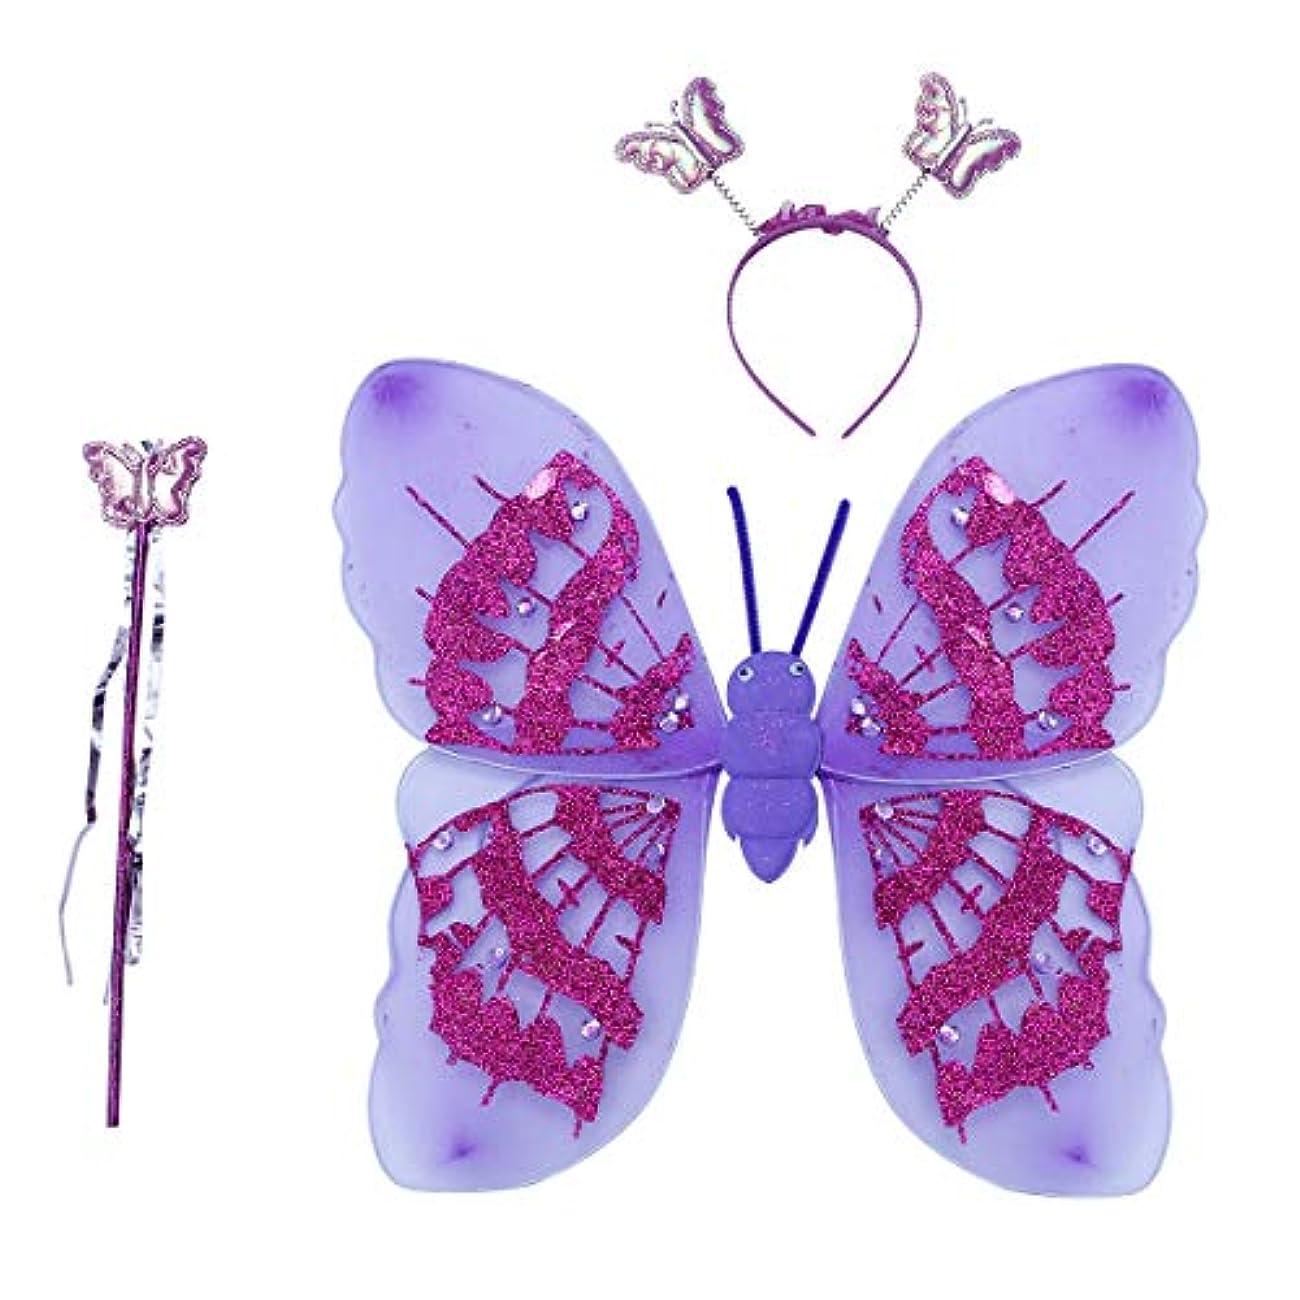 BESTOYARD ガールズフェアリーバタフライウィングスコスチュームヘアバンドフェアリーワンドパフォーマンスコスチュームセットパーティーコスチュームセット(3pcs、Purple)